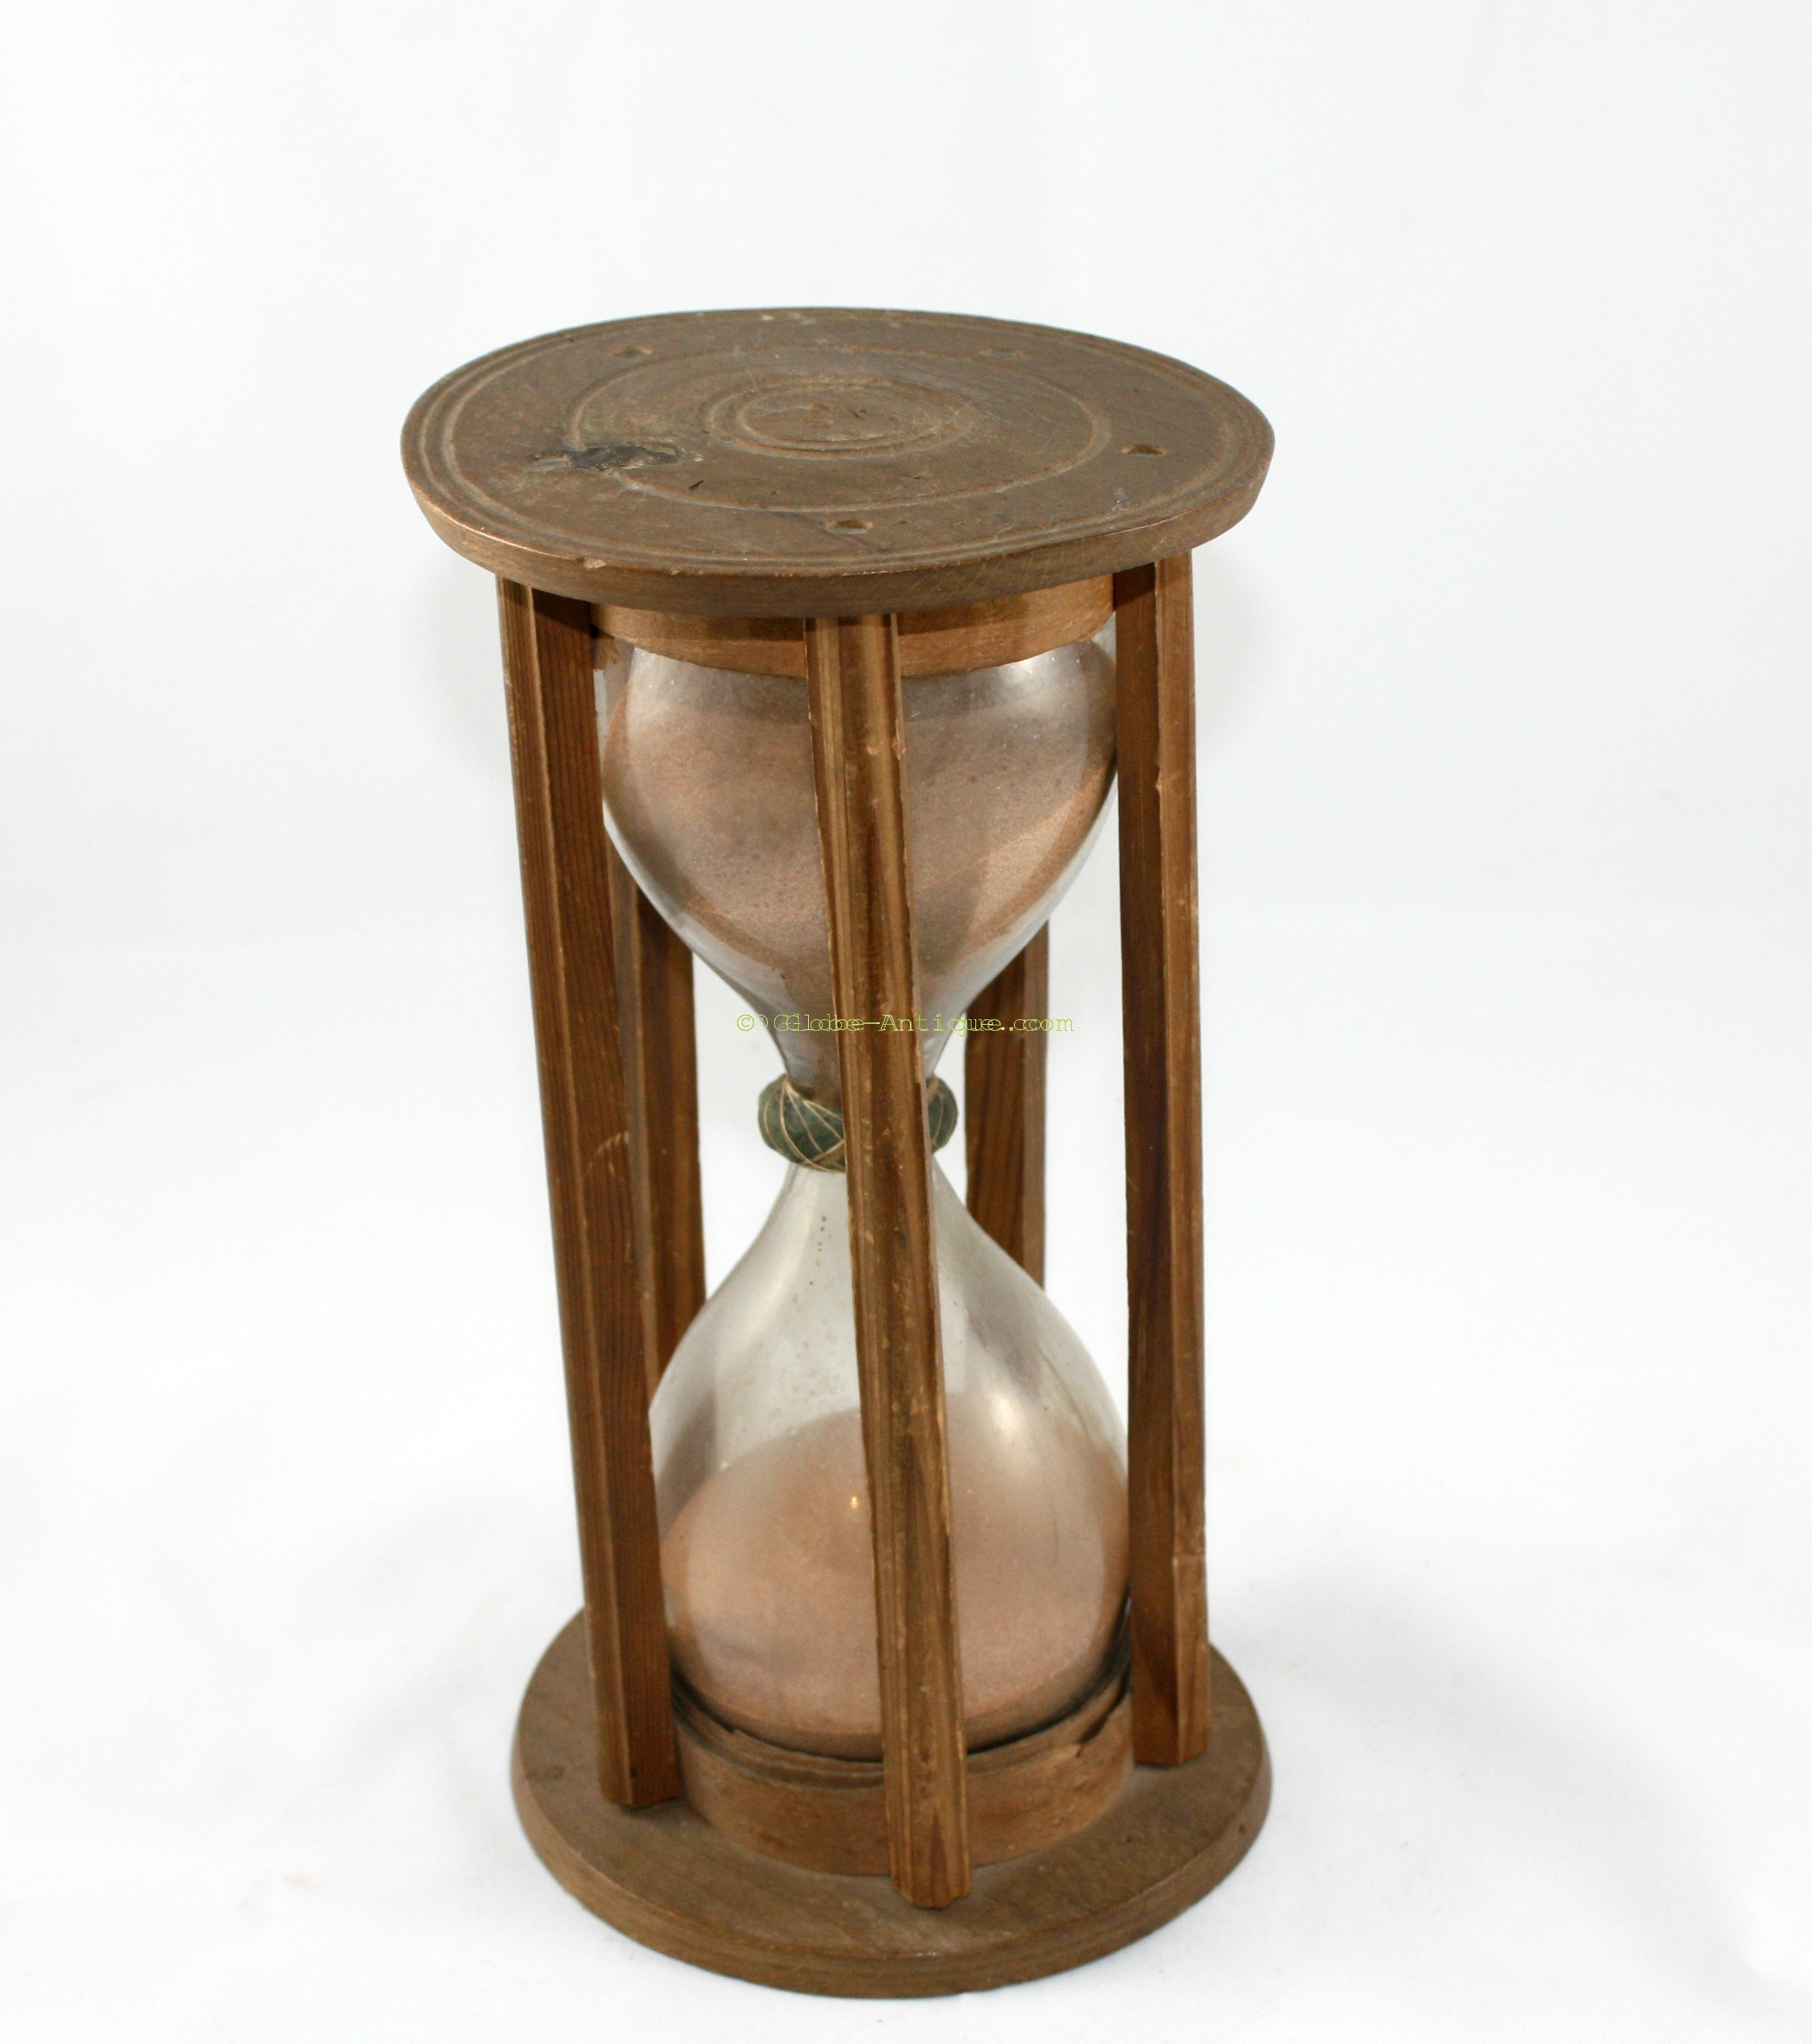 Nautical Hourglass 18th Century Antique Scientific And Nautical Instruments